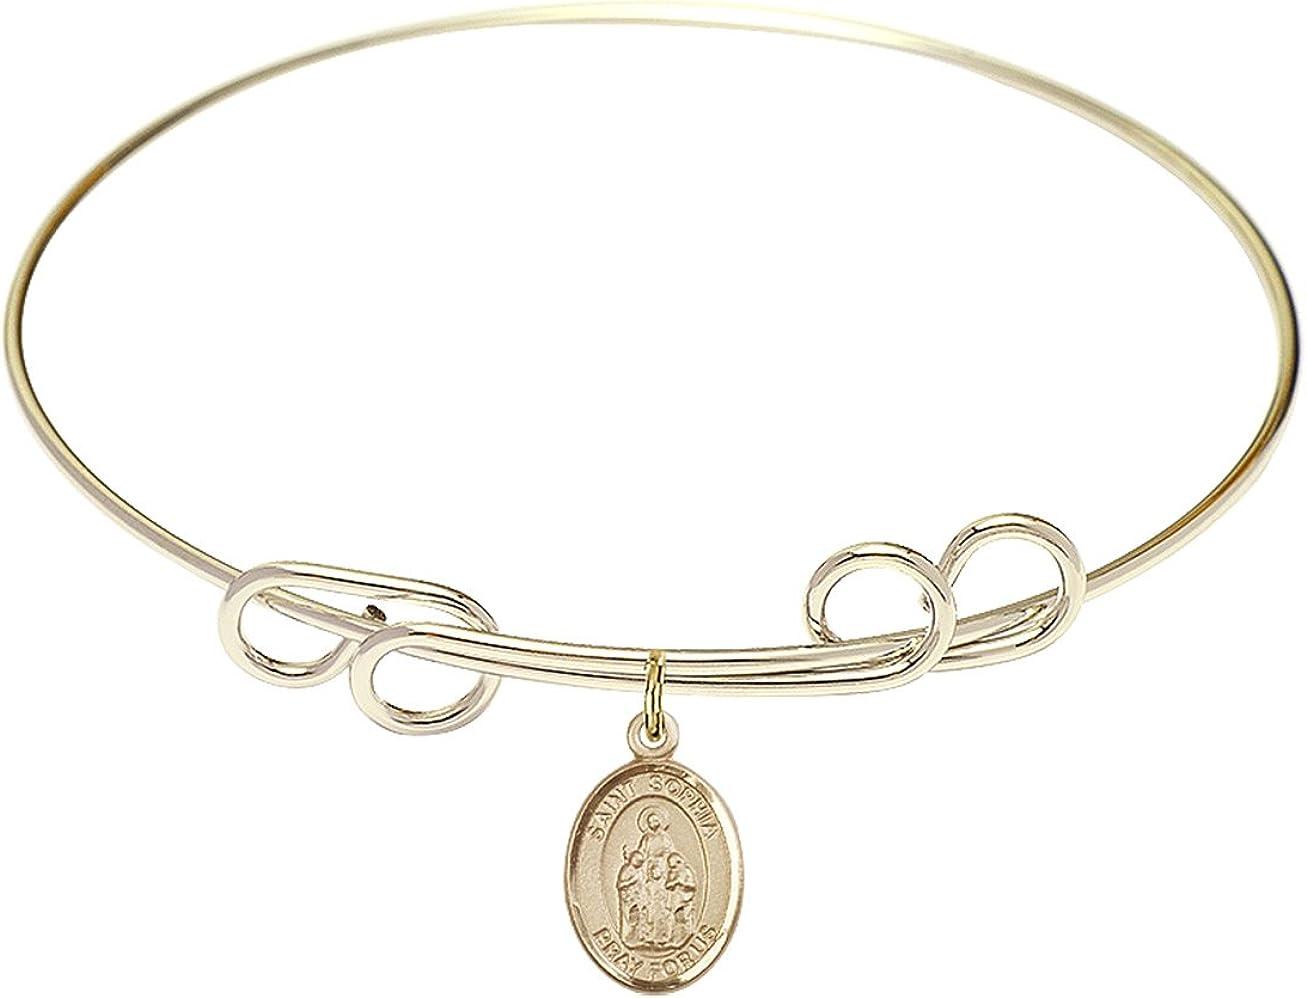 DiamondJewelryNY Double Loop Bangle Bracelet with a St. Sophia Charm.